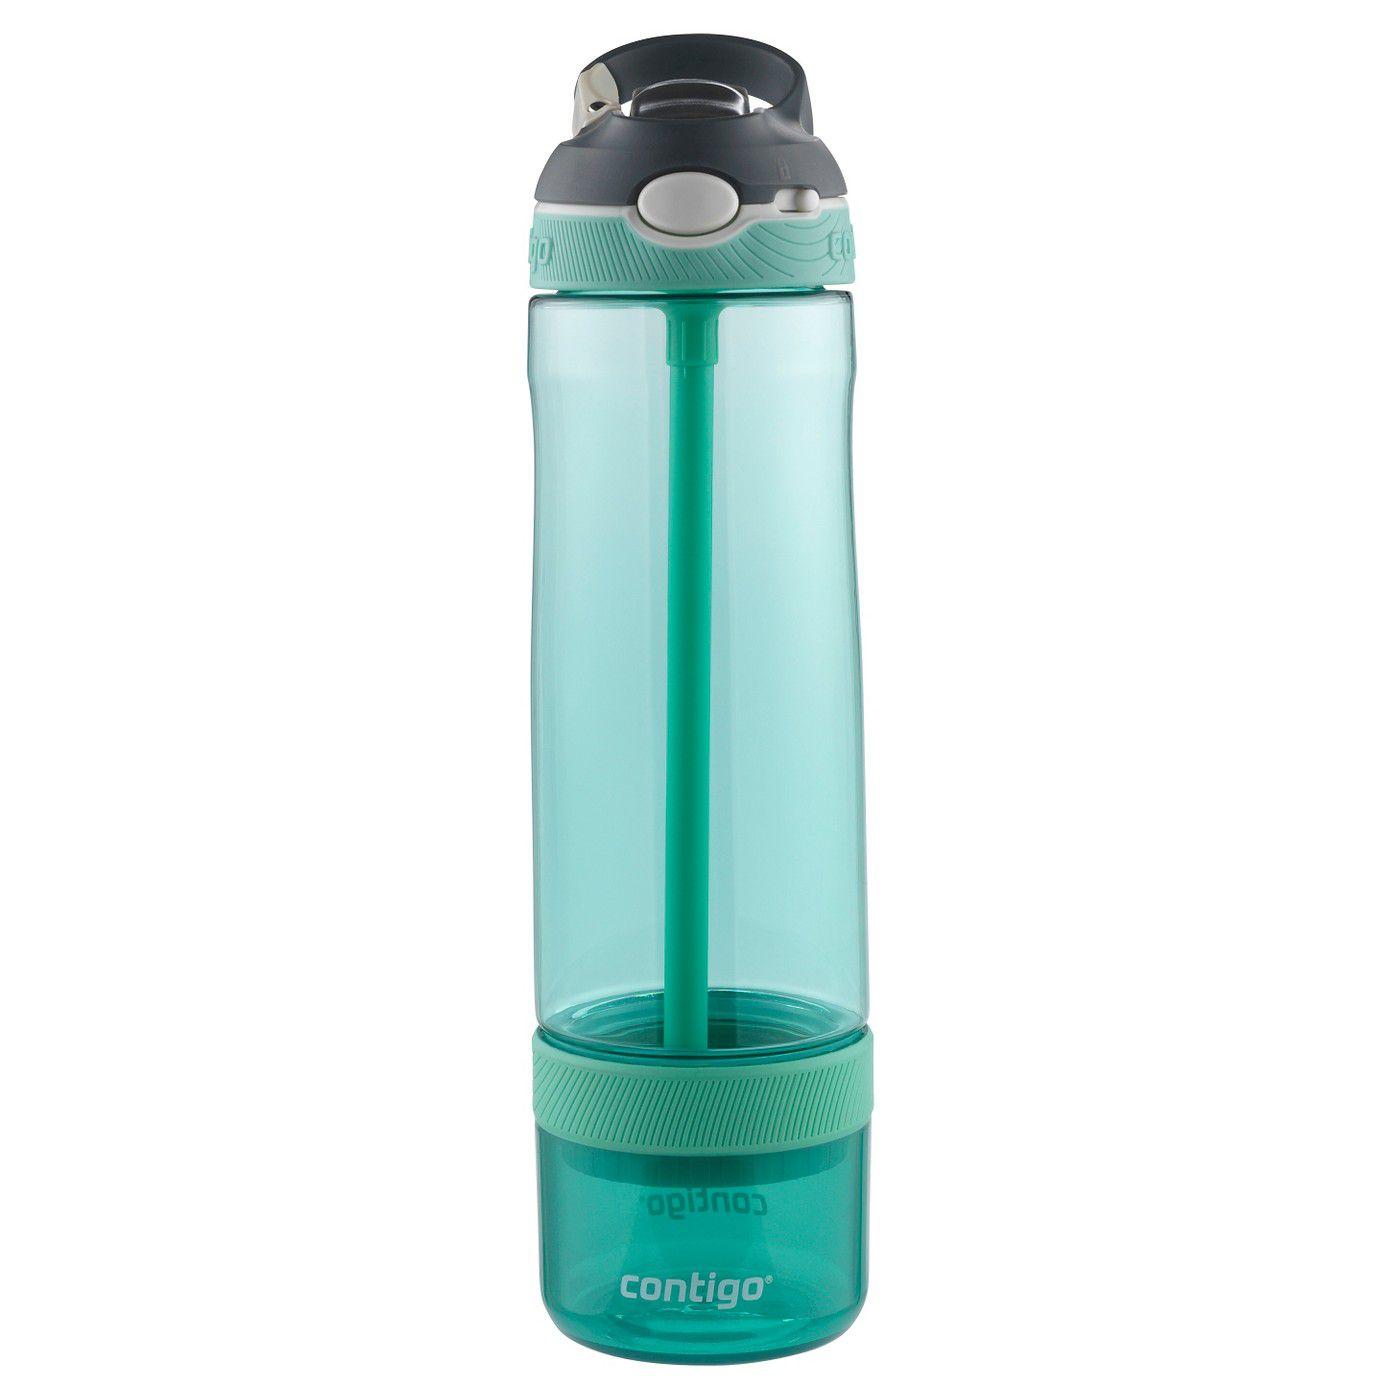 Contigo Autospout Straw Ashland Plastic Infuser Bottle